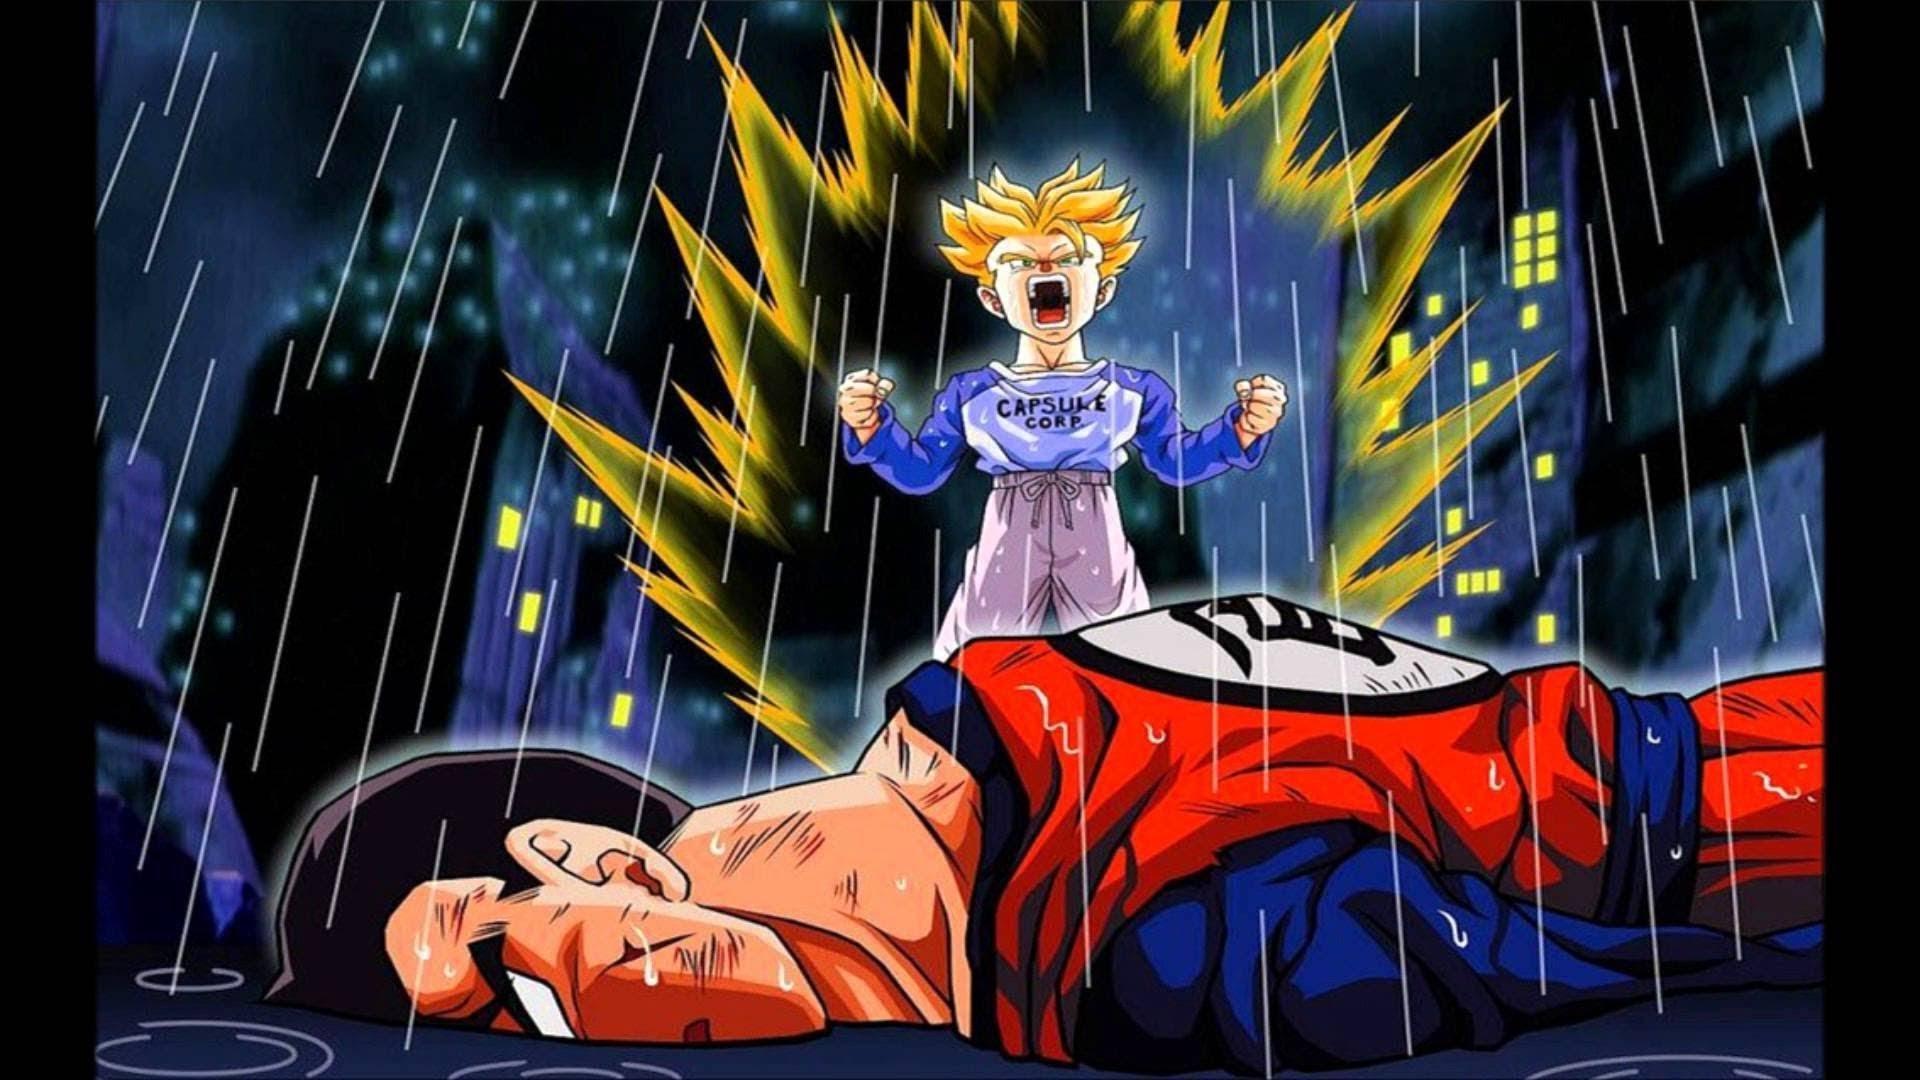 Future Trunks meets Gohan – Reunion + Future gohan death Dragon ball Super  52 discussion